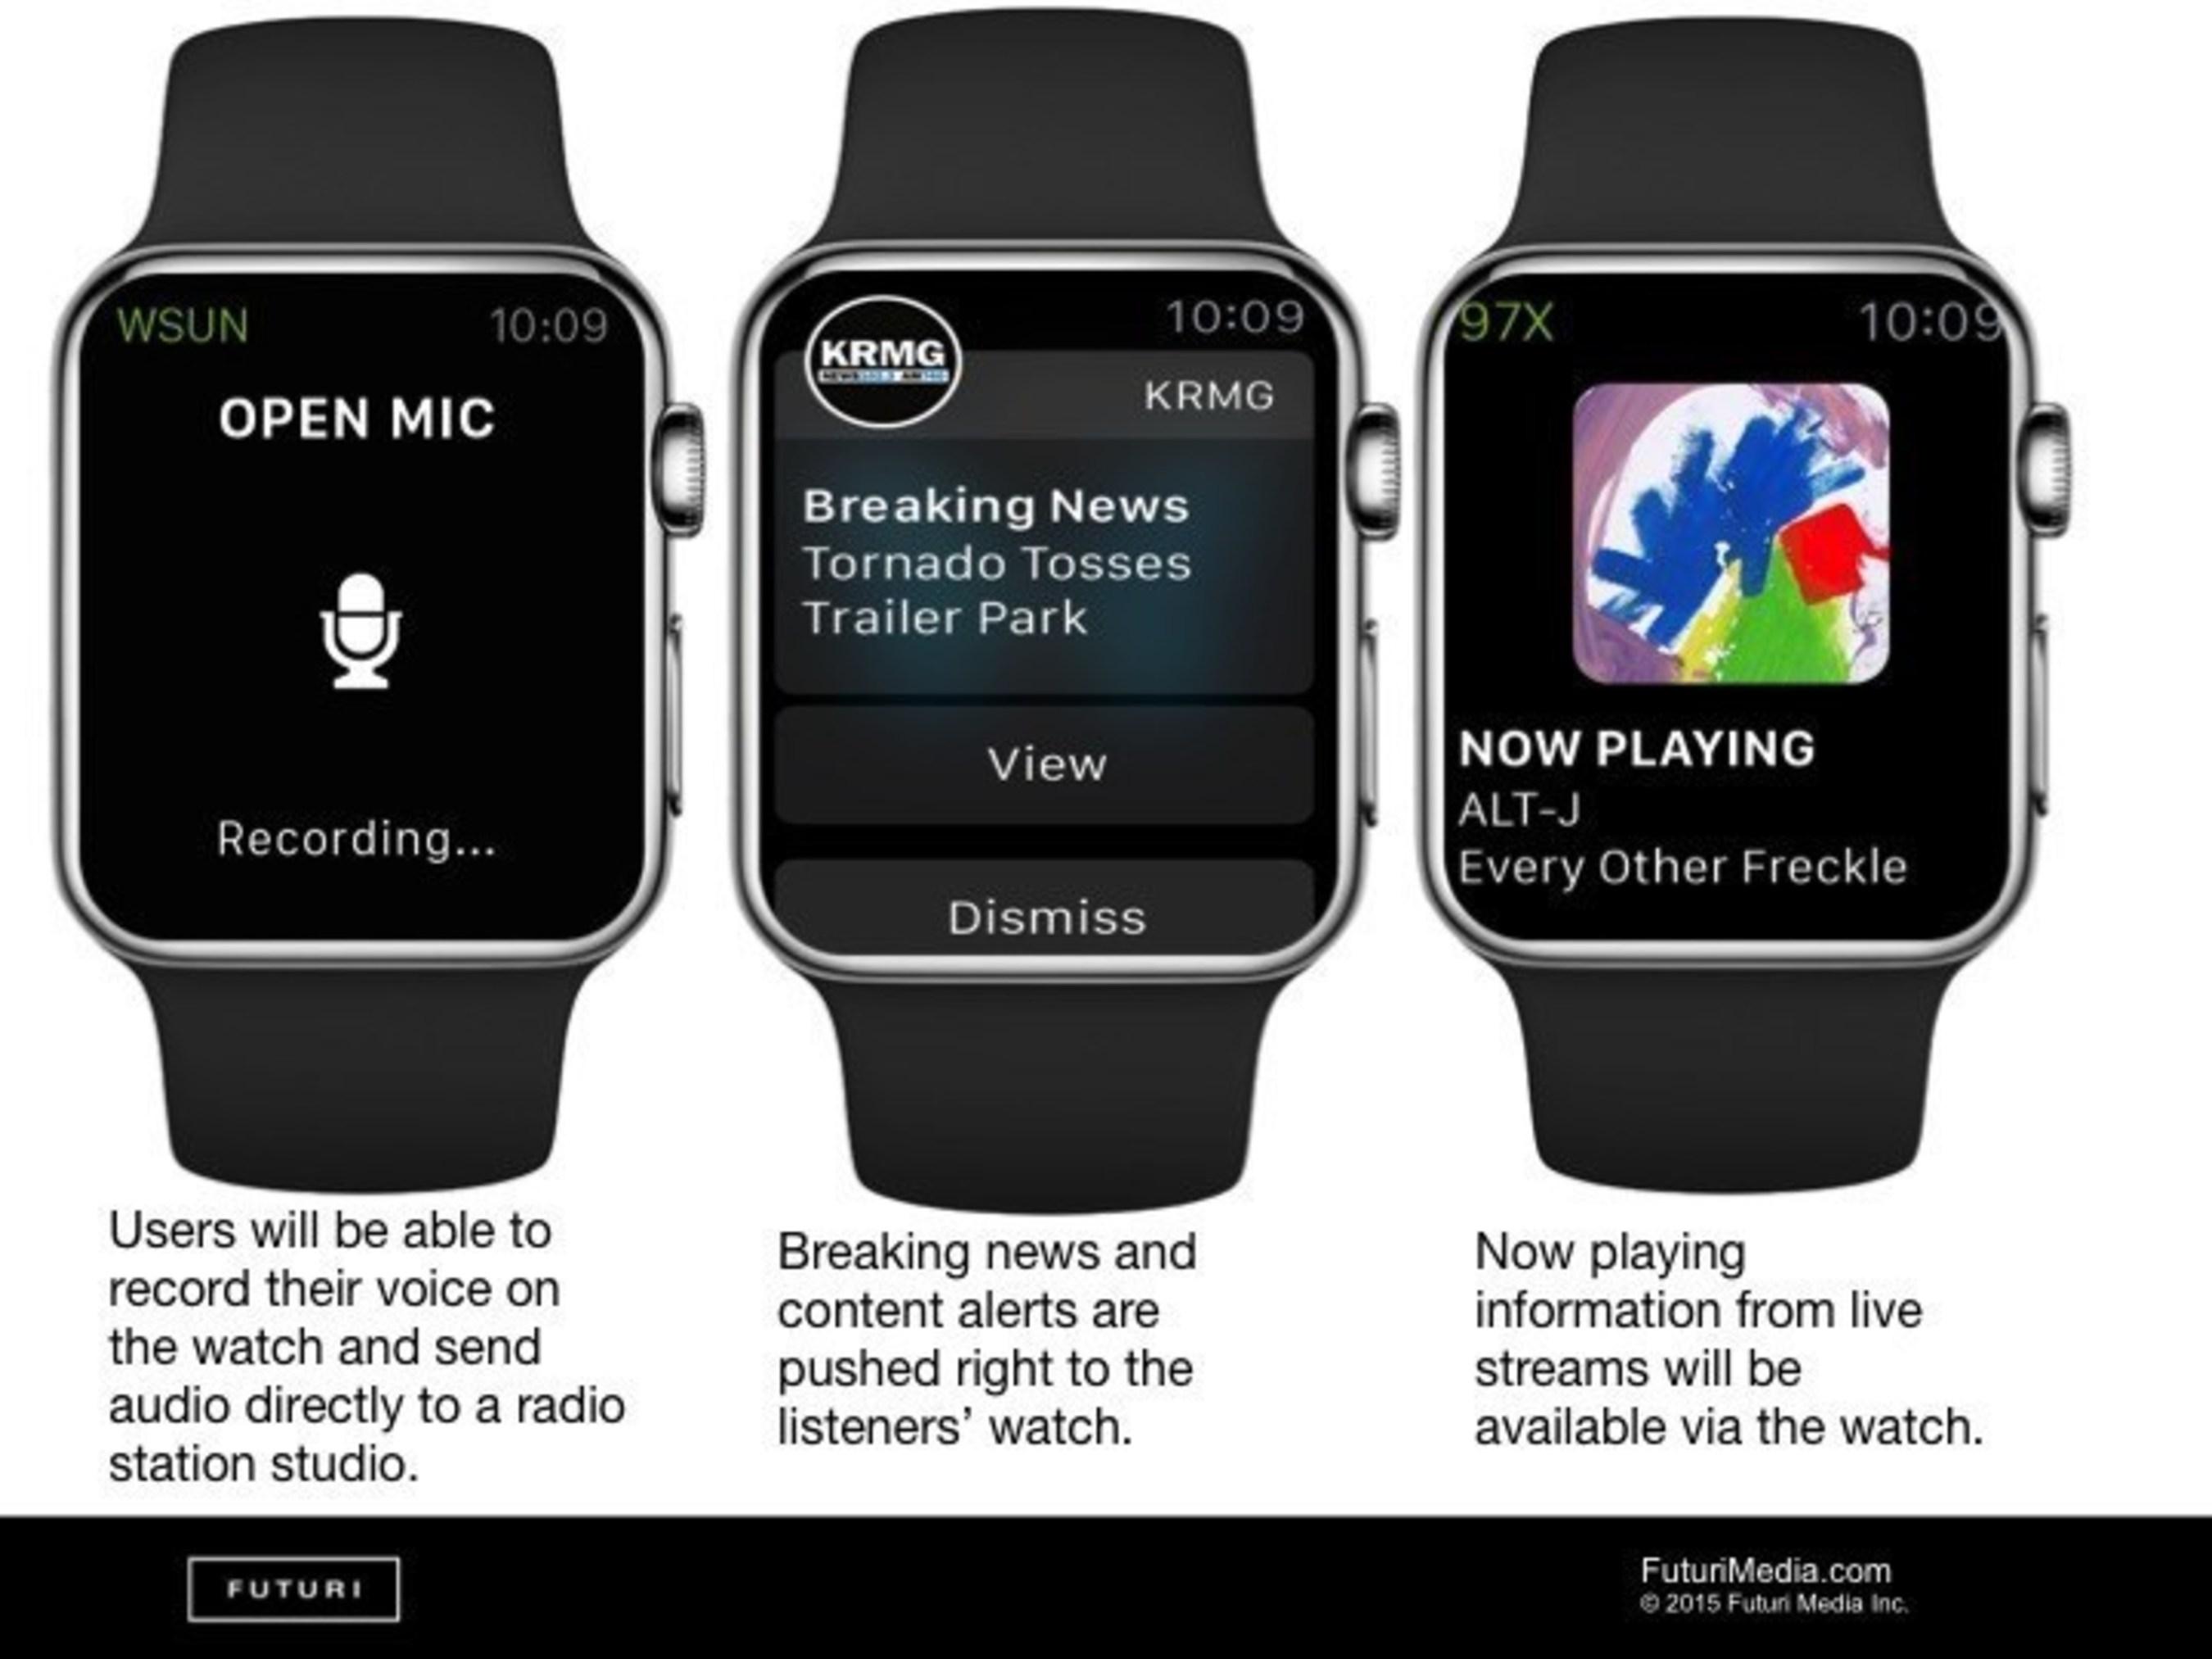 Futuri Media Announces Integration with Apple Watch and Futuri Mobile Platform